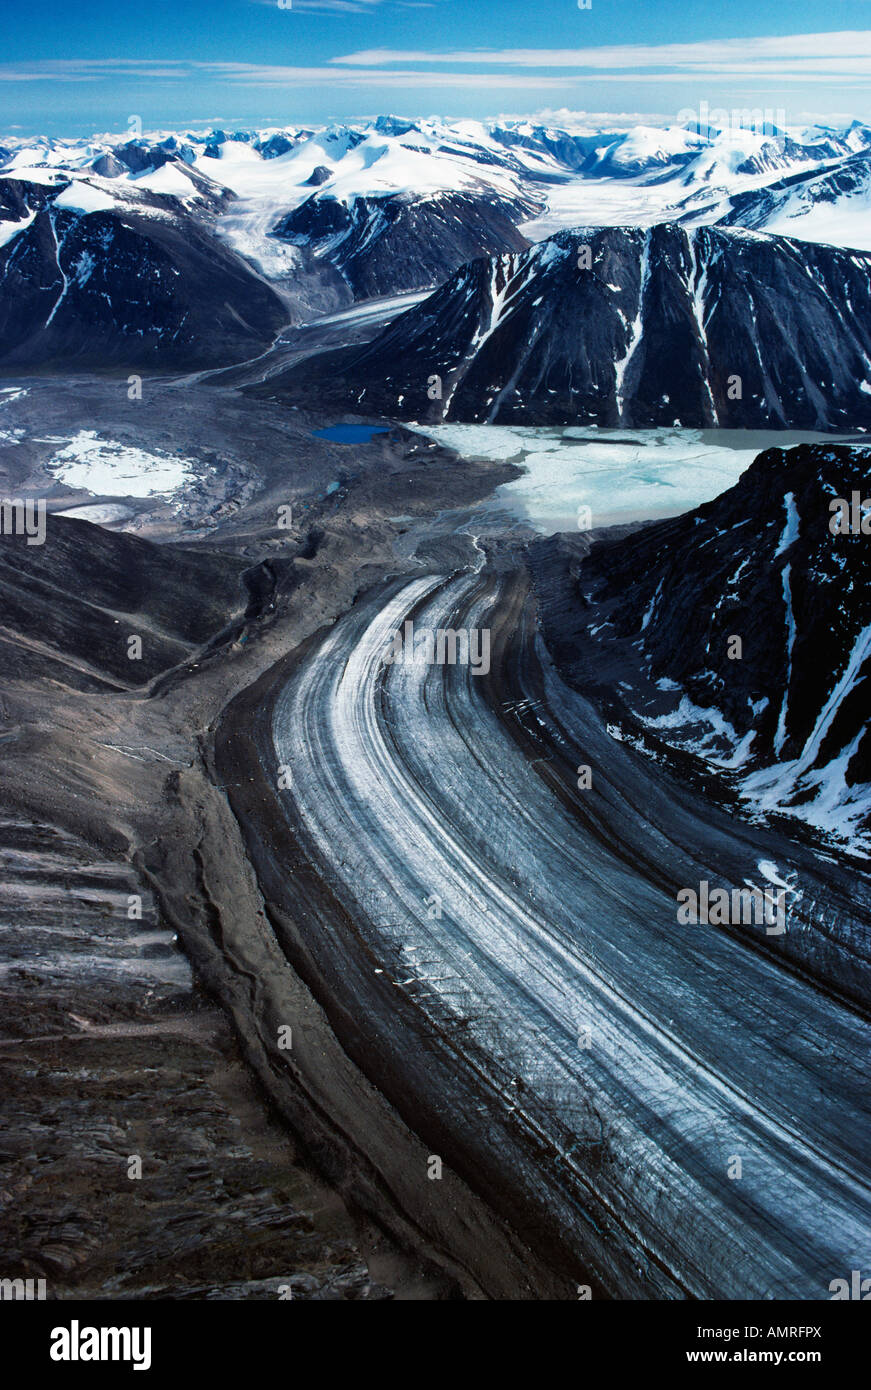 Aerial View Of Norman Glacier, Glacier Lake, Mt Battle Auyuittuq National Park, Nunavut, Canada Stock Photo